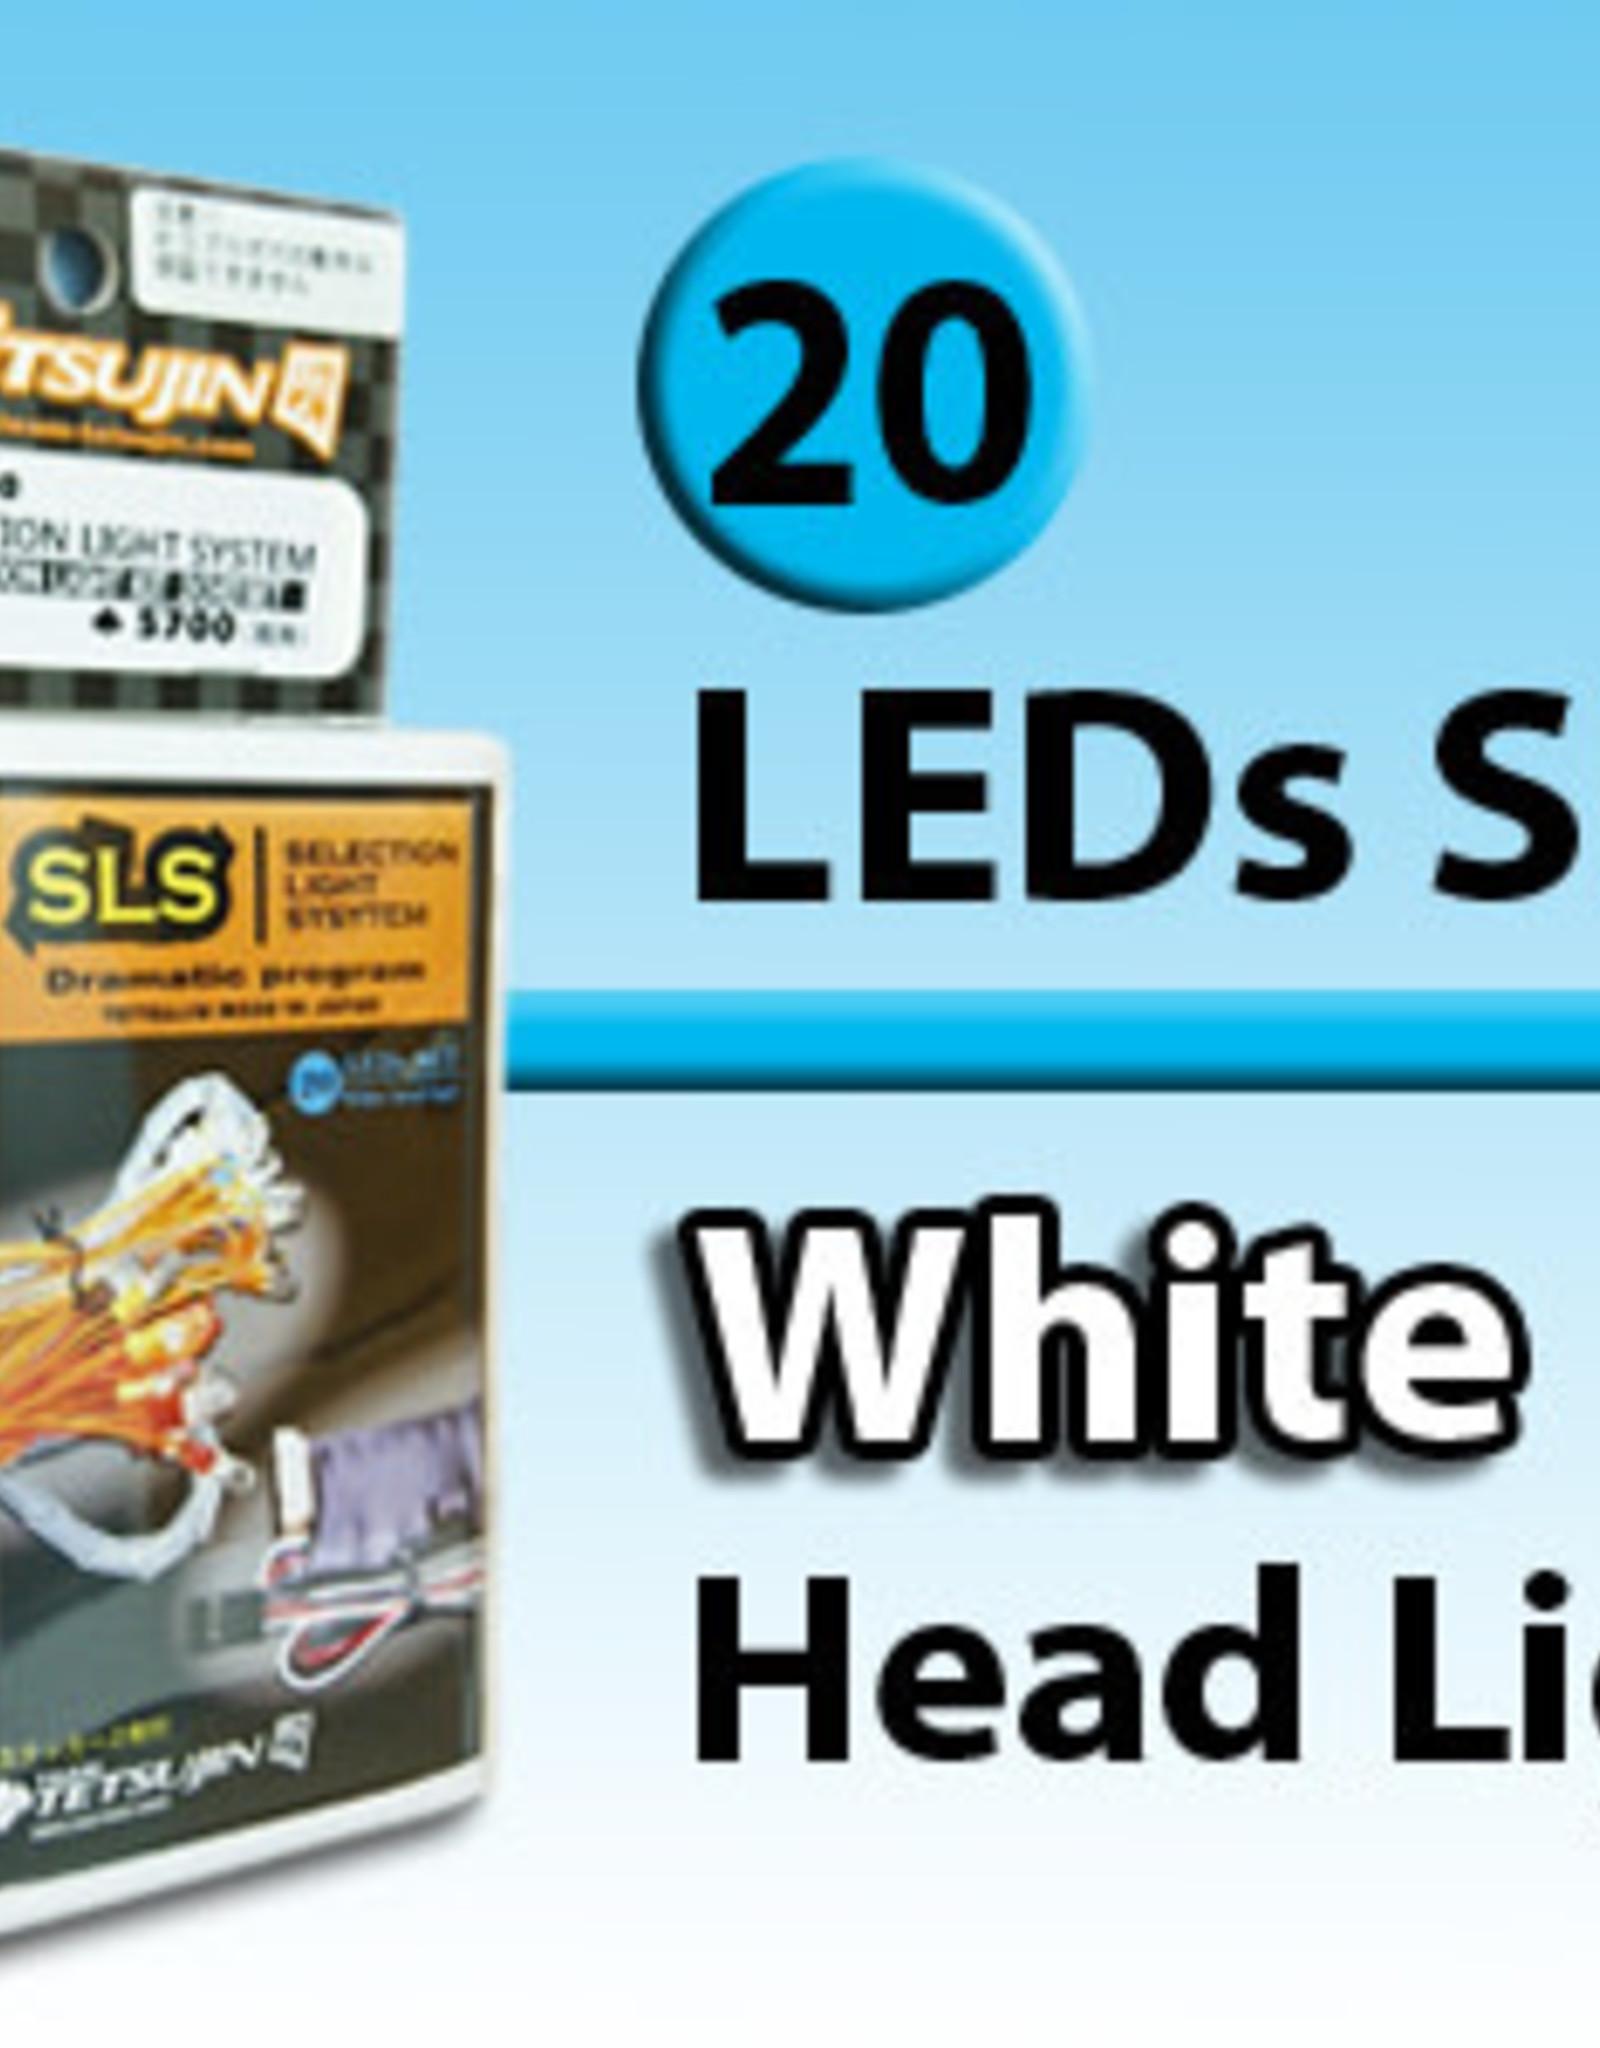 Tetsujin TT-7830 ''SLS'' 20 LED set (Front 10 Rear 10) for RC Car by Tetsujin